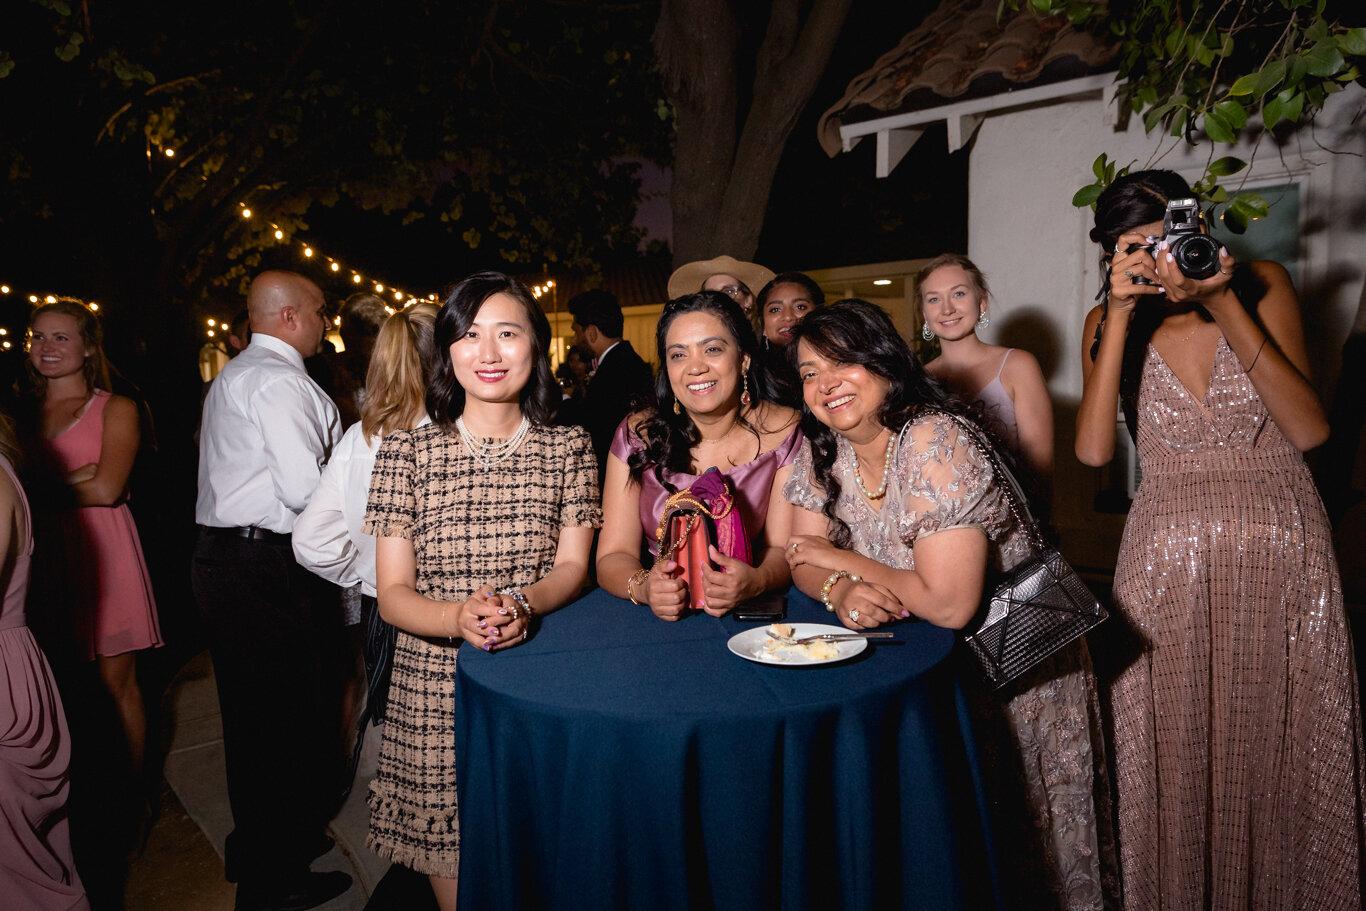 2019.08.24_Emily-Ashir-Wedding-at-the-Maples-6419.jpg